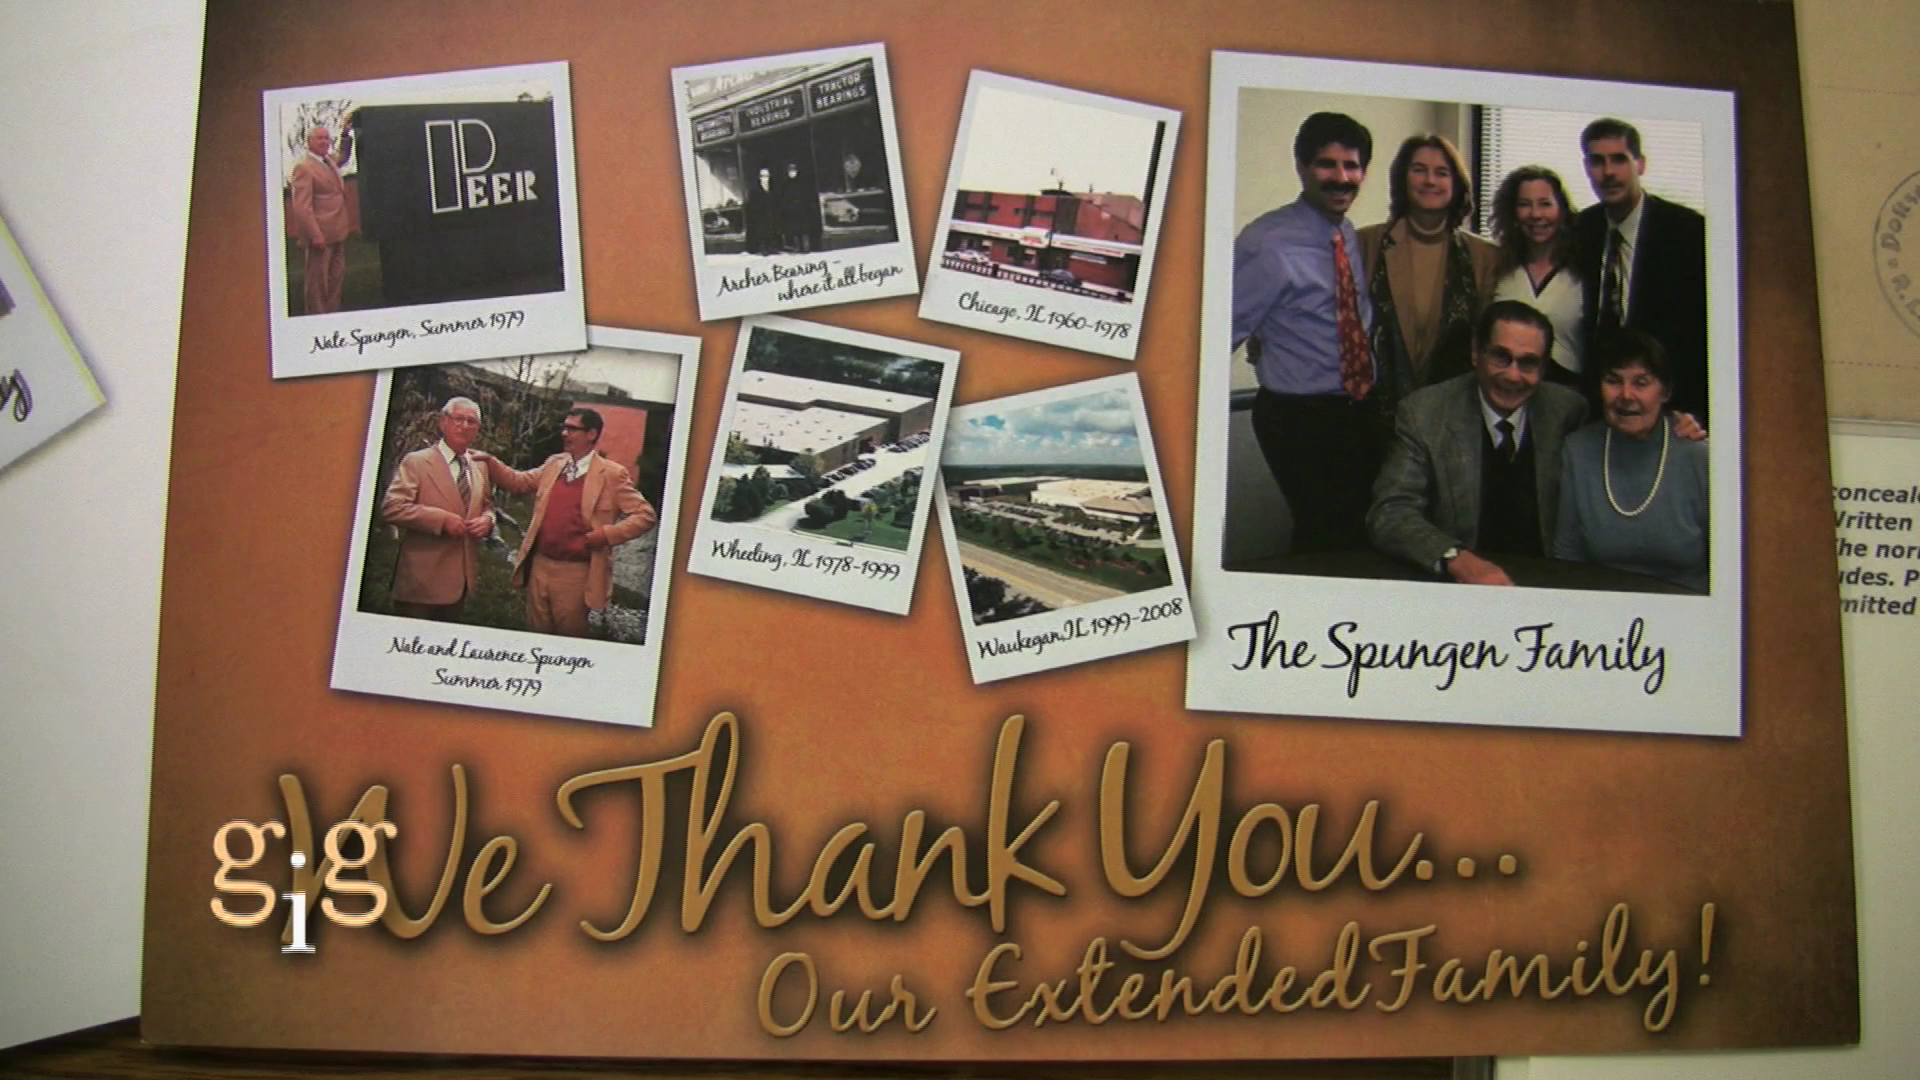 Spungen family donates $6.6 million to PEER Chain employees